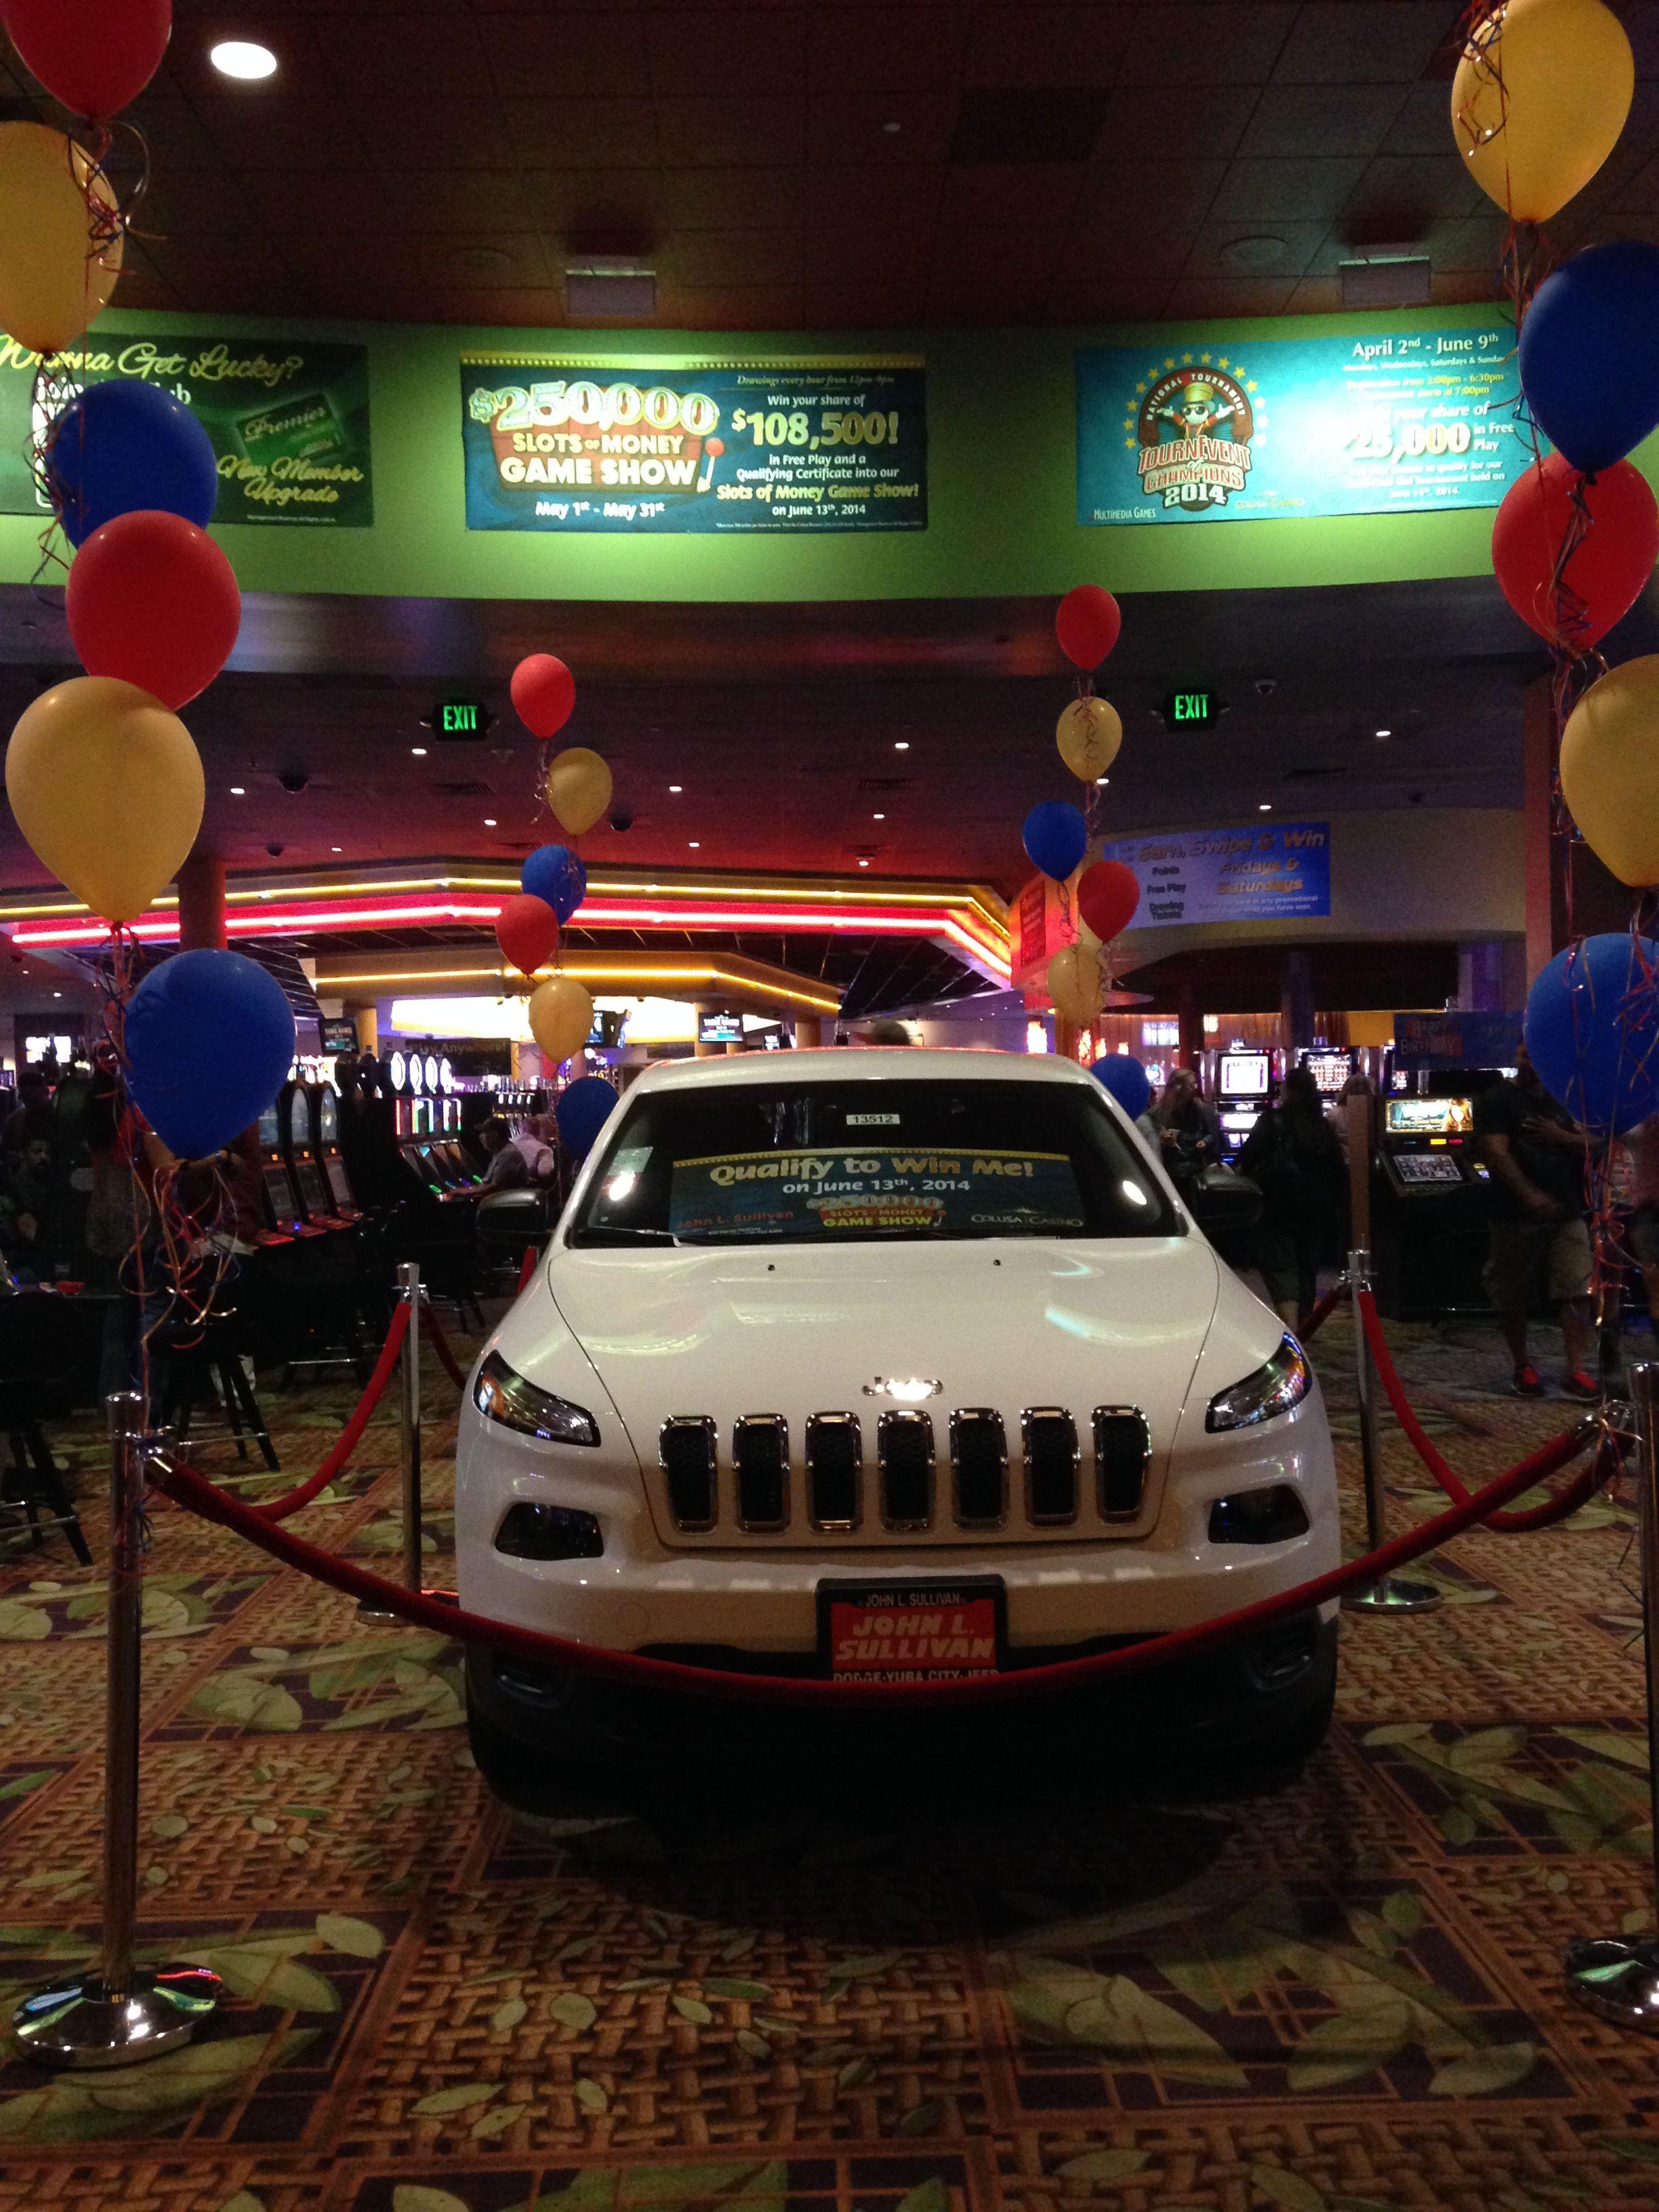 California casino colusa casino gambling online rating software